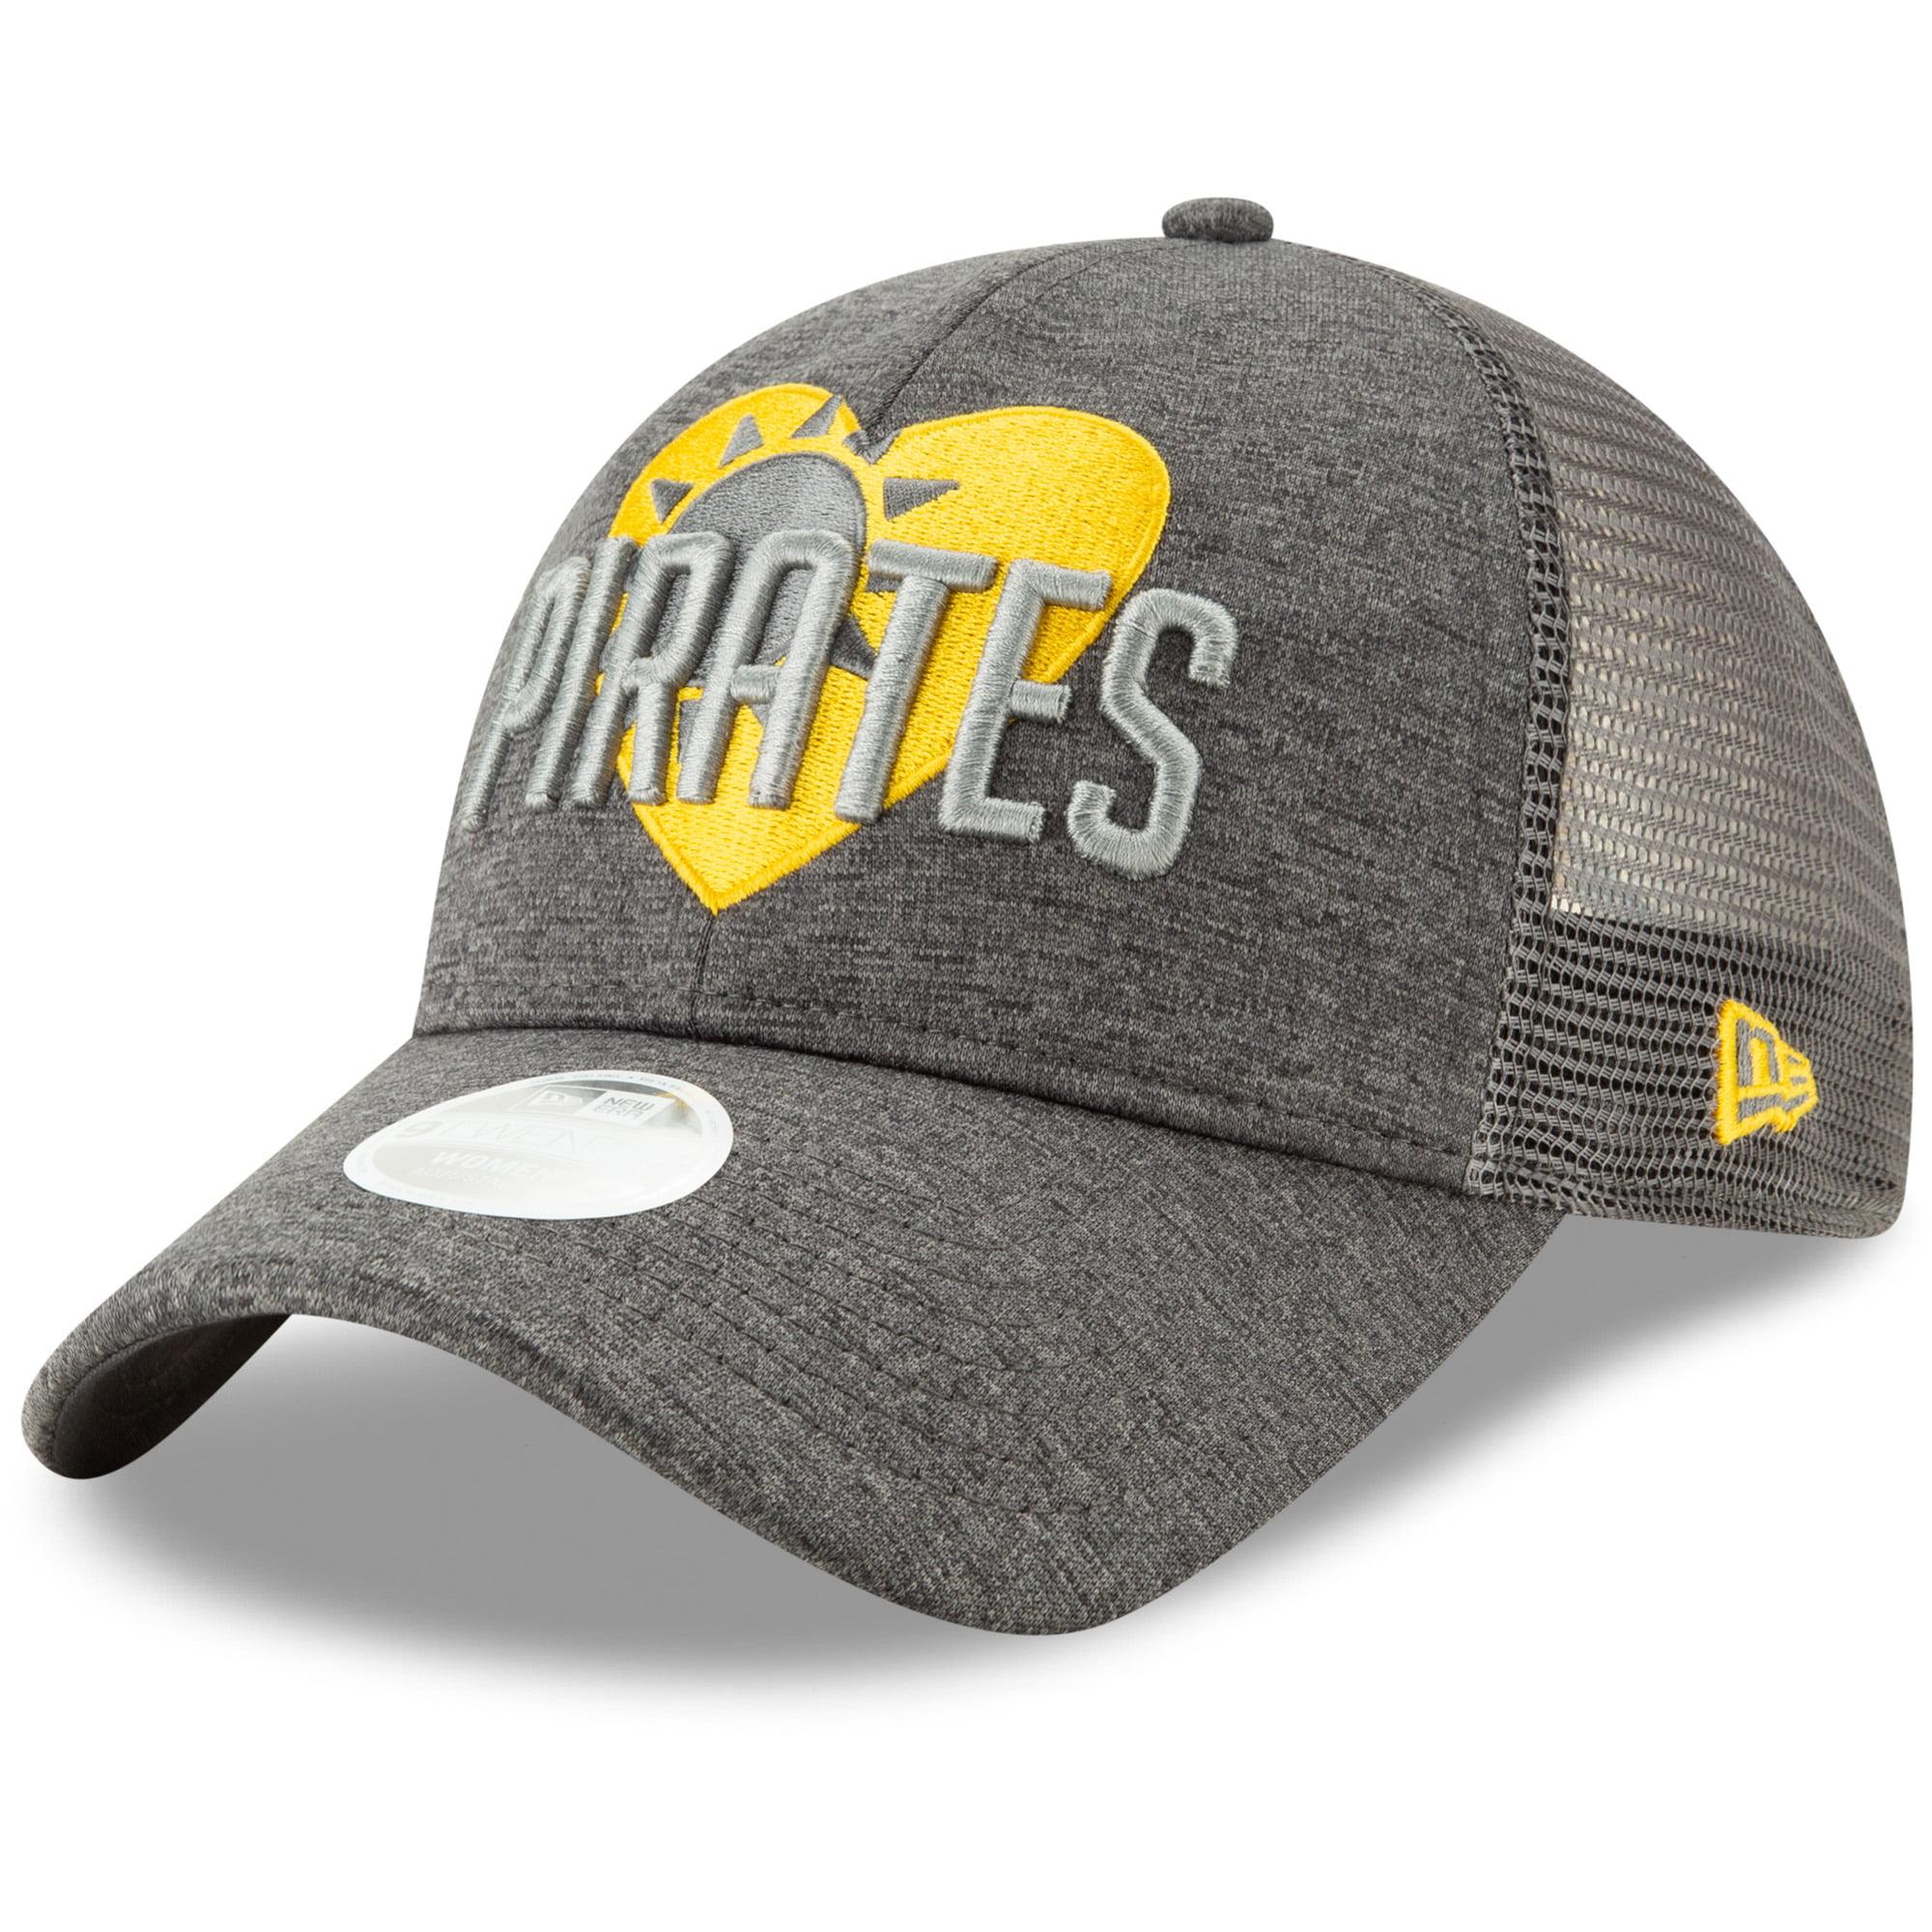 Pittsburgh Pirates New Era Women's Sunny Snapped Love 9TWENTY Adjustable Trucker Hat - Graphite/Yellow - OSFA